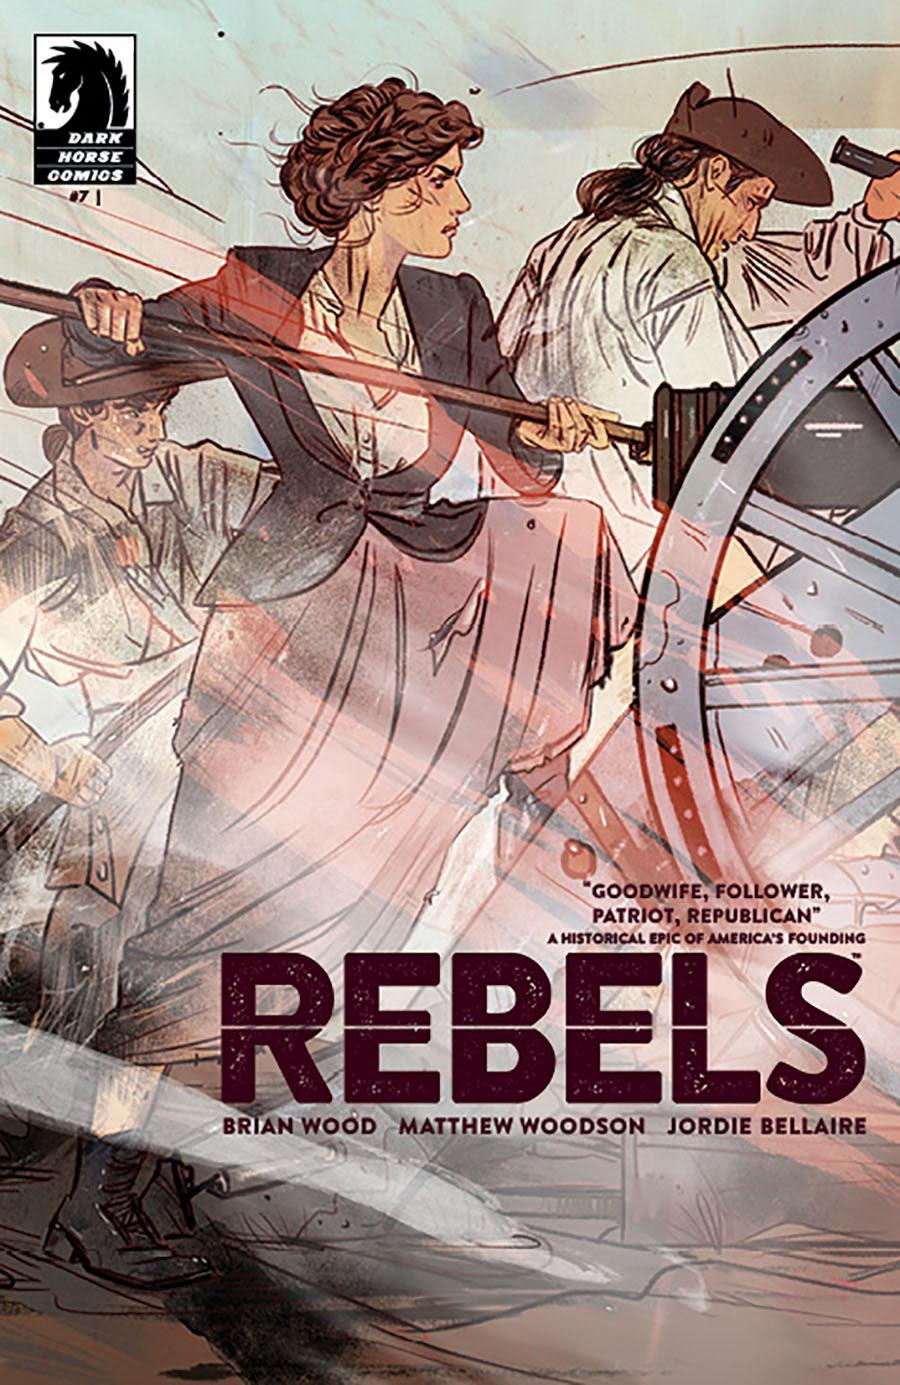 Image result for rebels brian wood